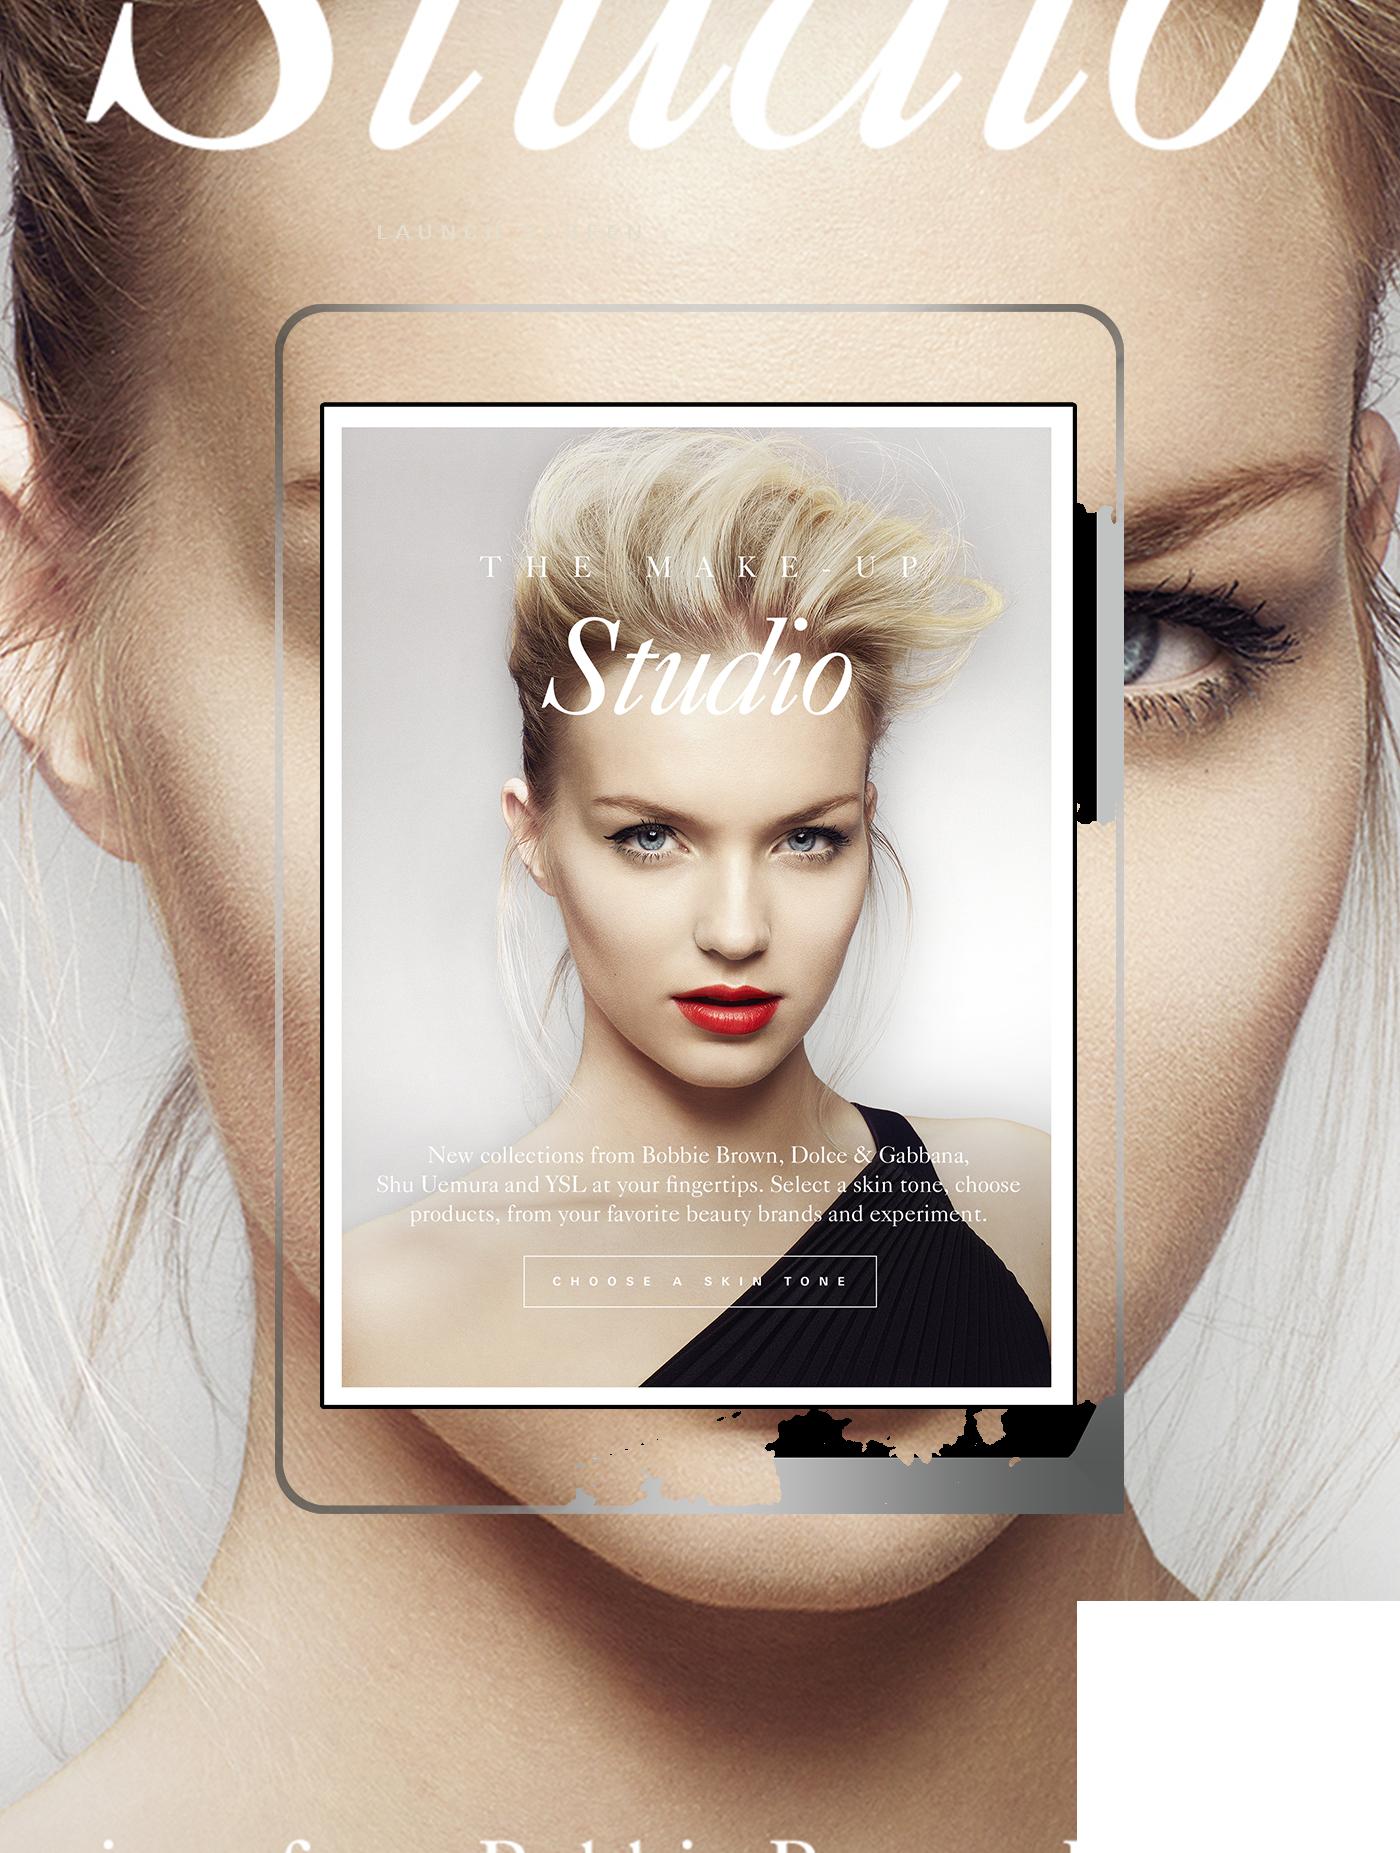 Harrods makeup make-up interactive studio app tablet beauty lips eyes chanel ysl Dior model face